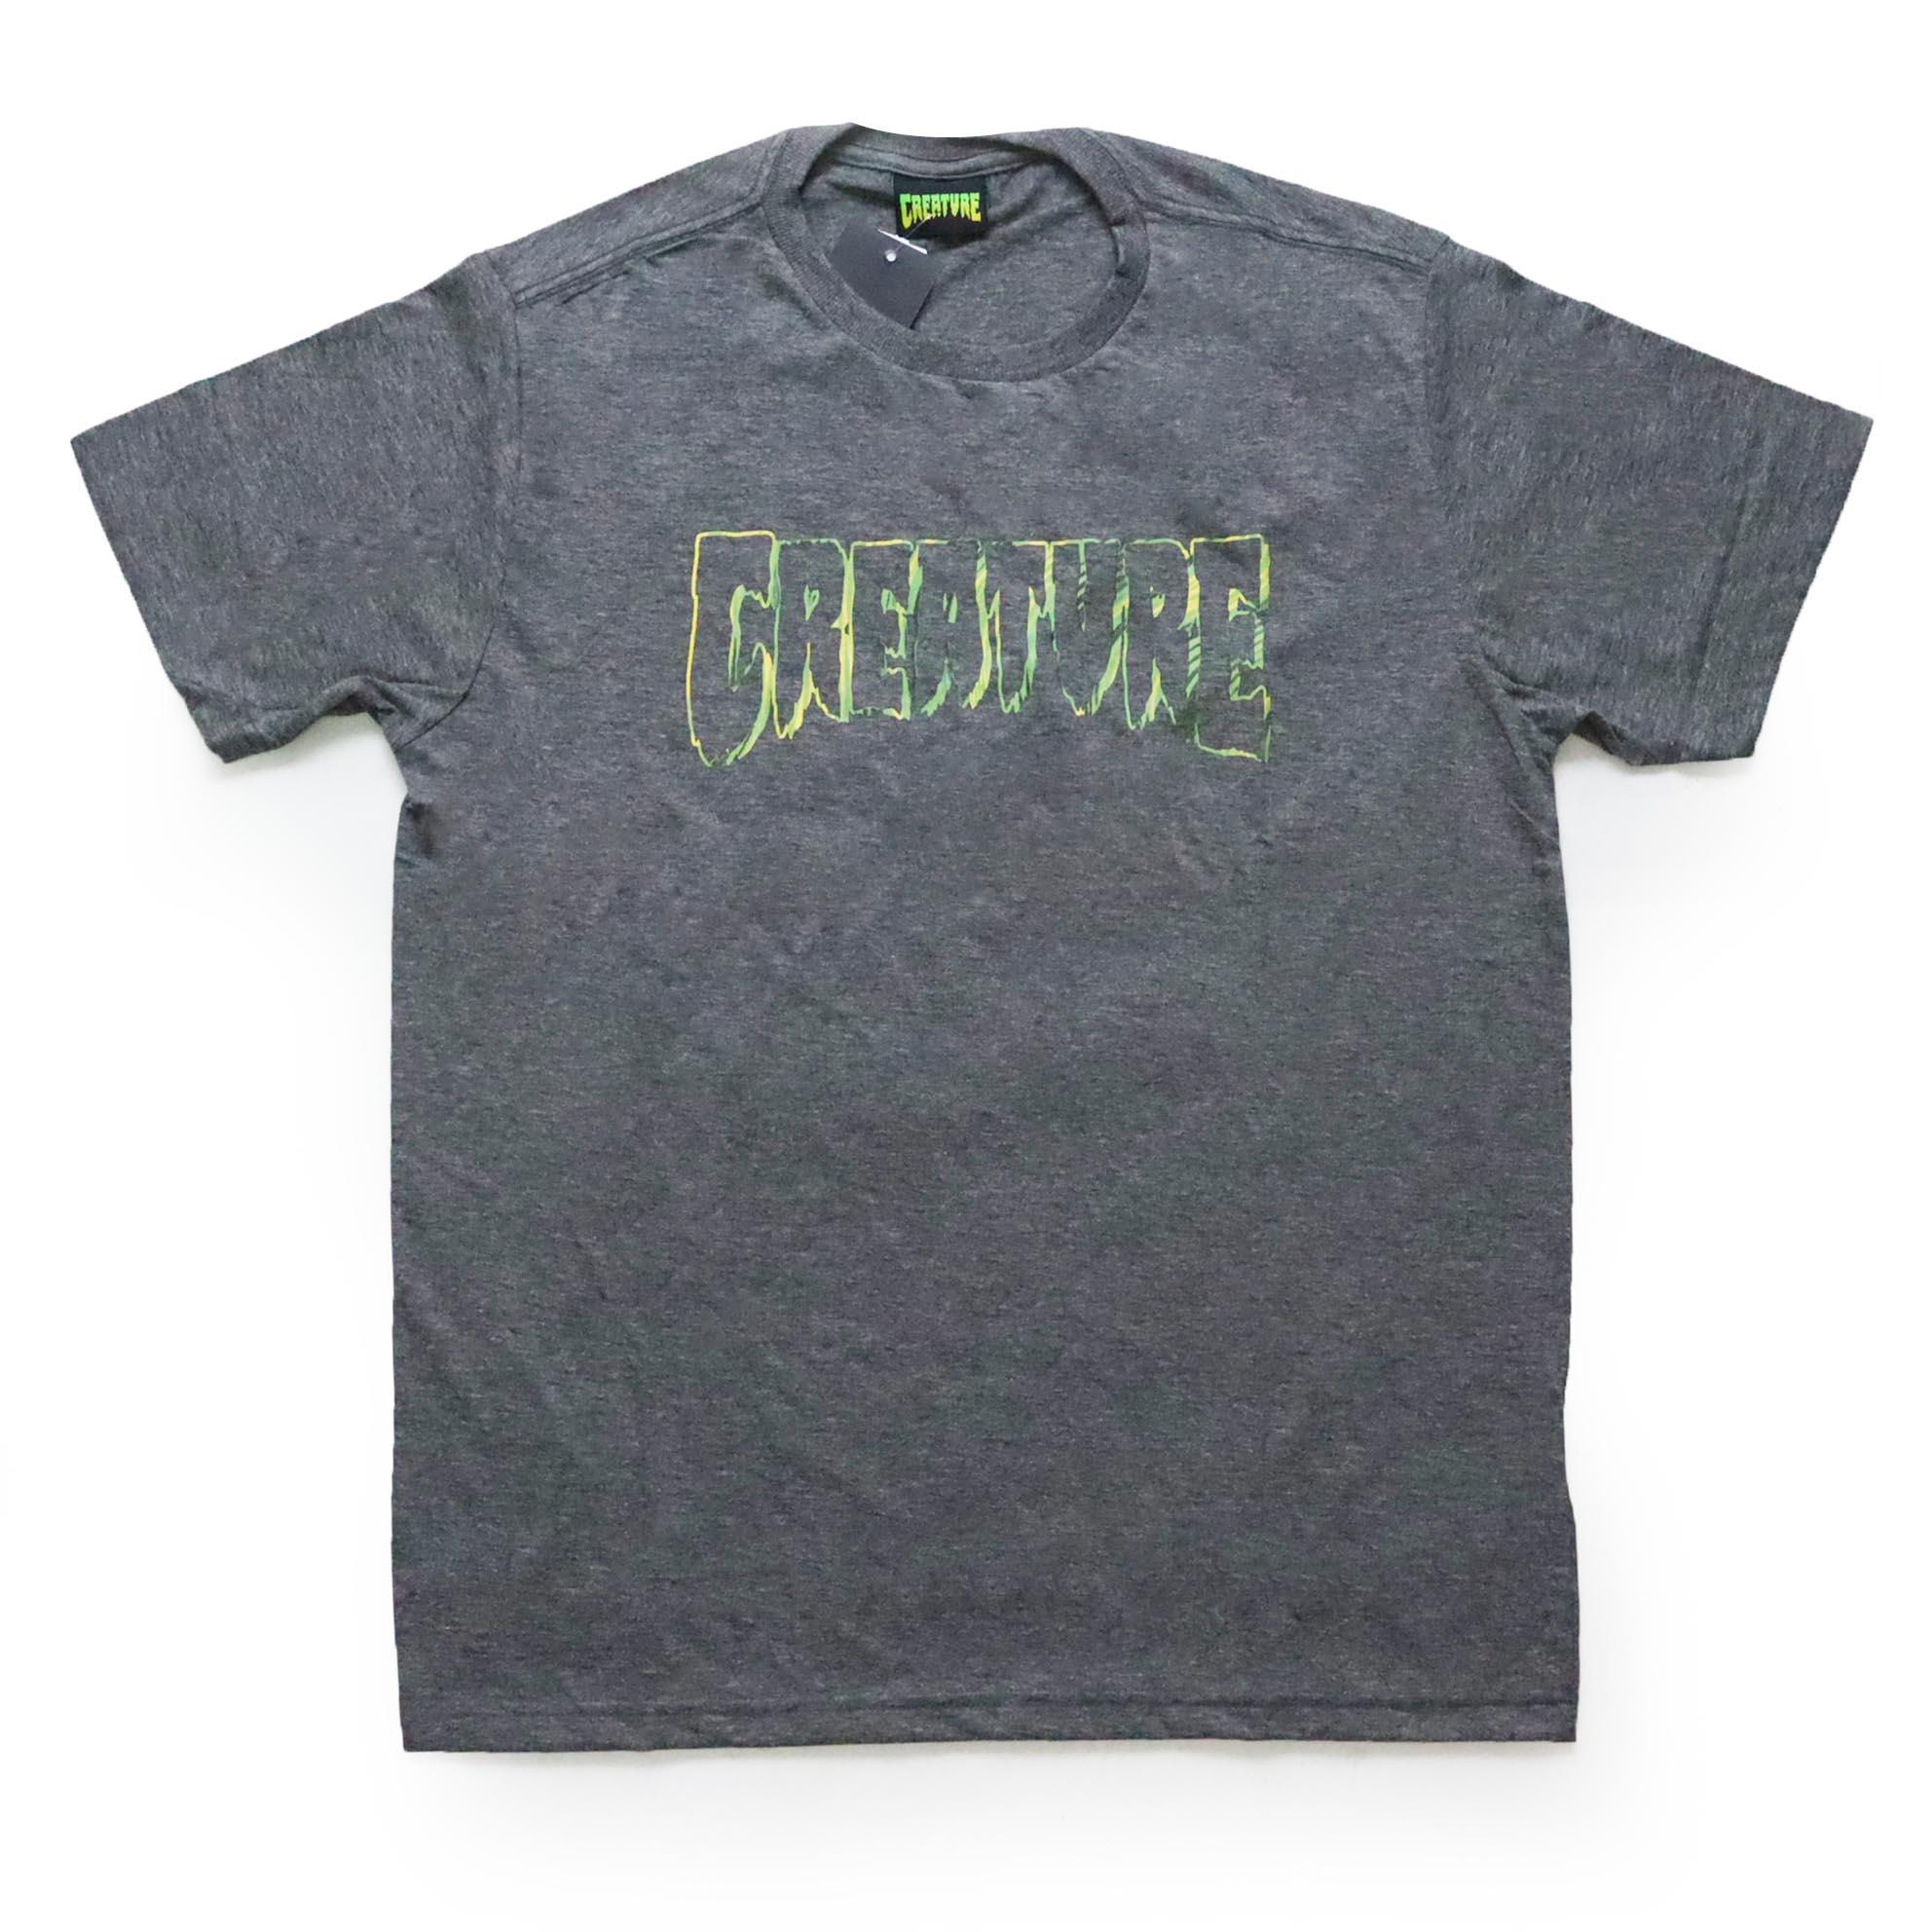 Camiseta Creature Psych Outline - Chumbo Mescla